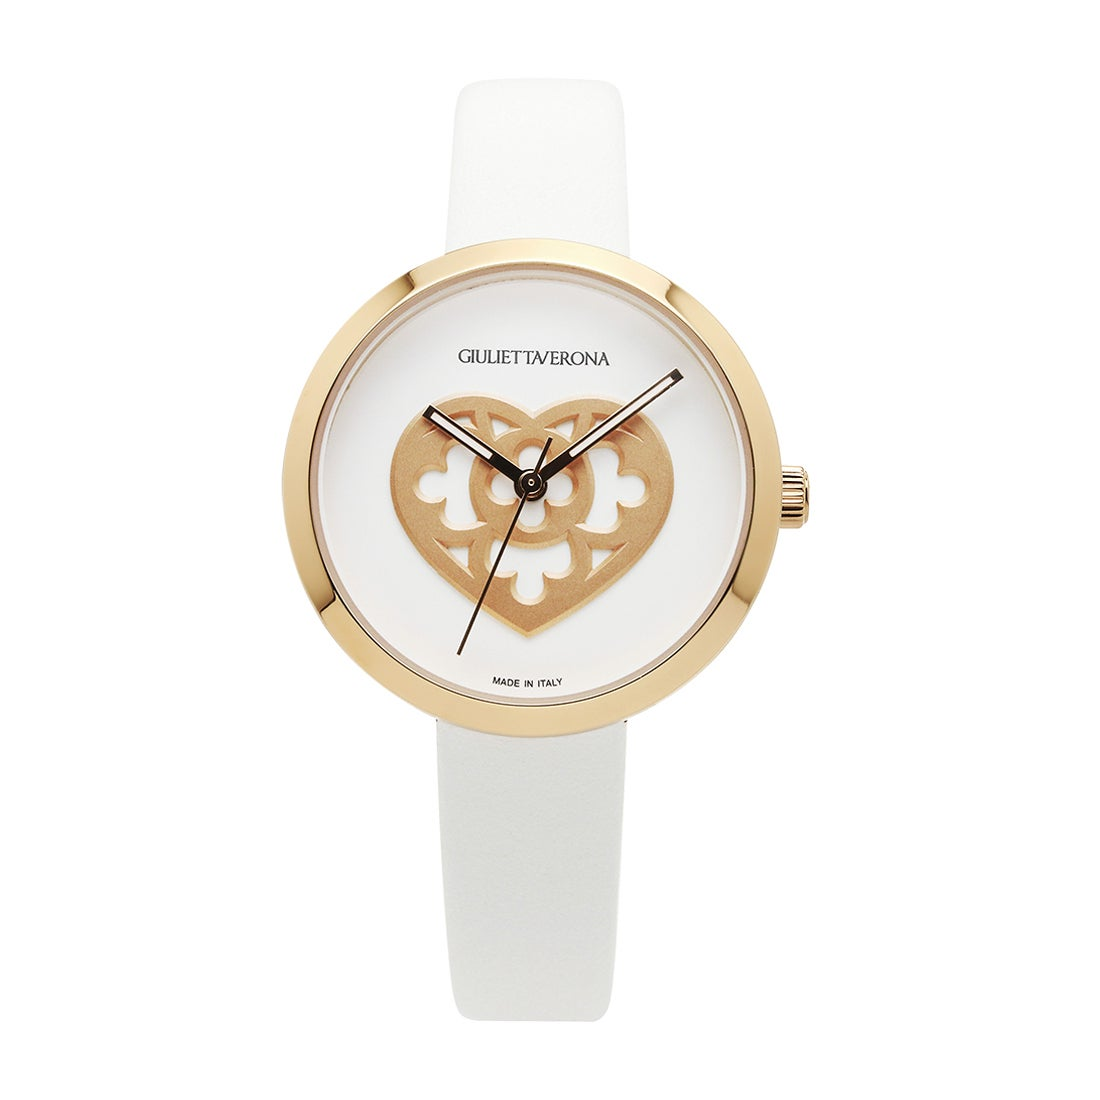 【SAC'S BAR】ジュリエッタヴェローナ GIULIETTAVERONA 腕時計 GV001 LOVE MEMORY ホワイト×ホワイト